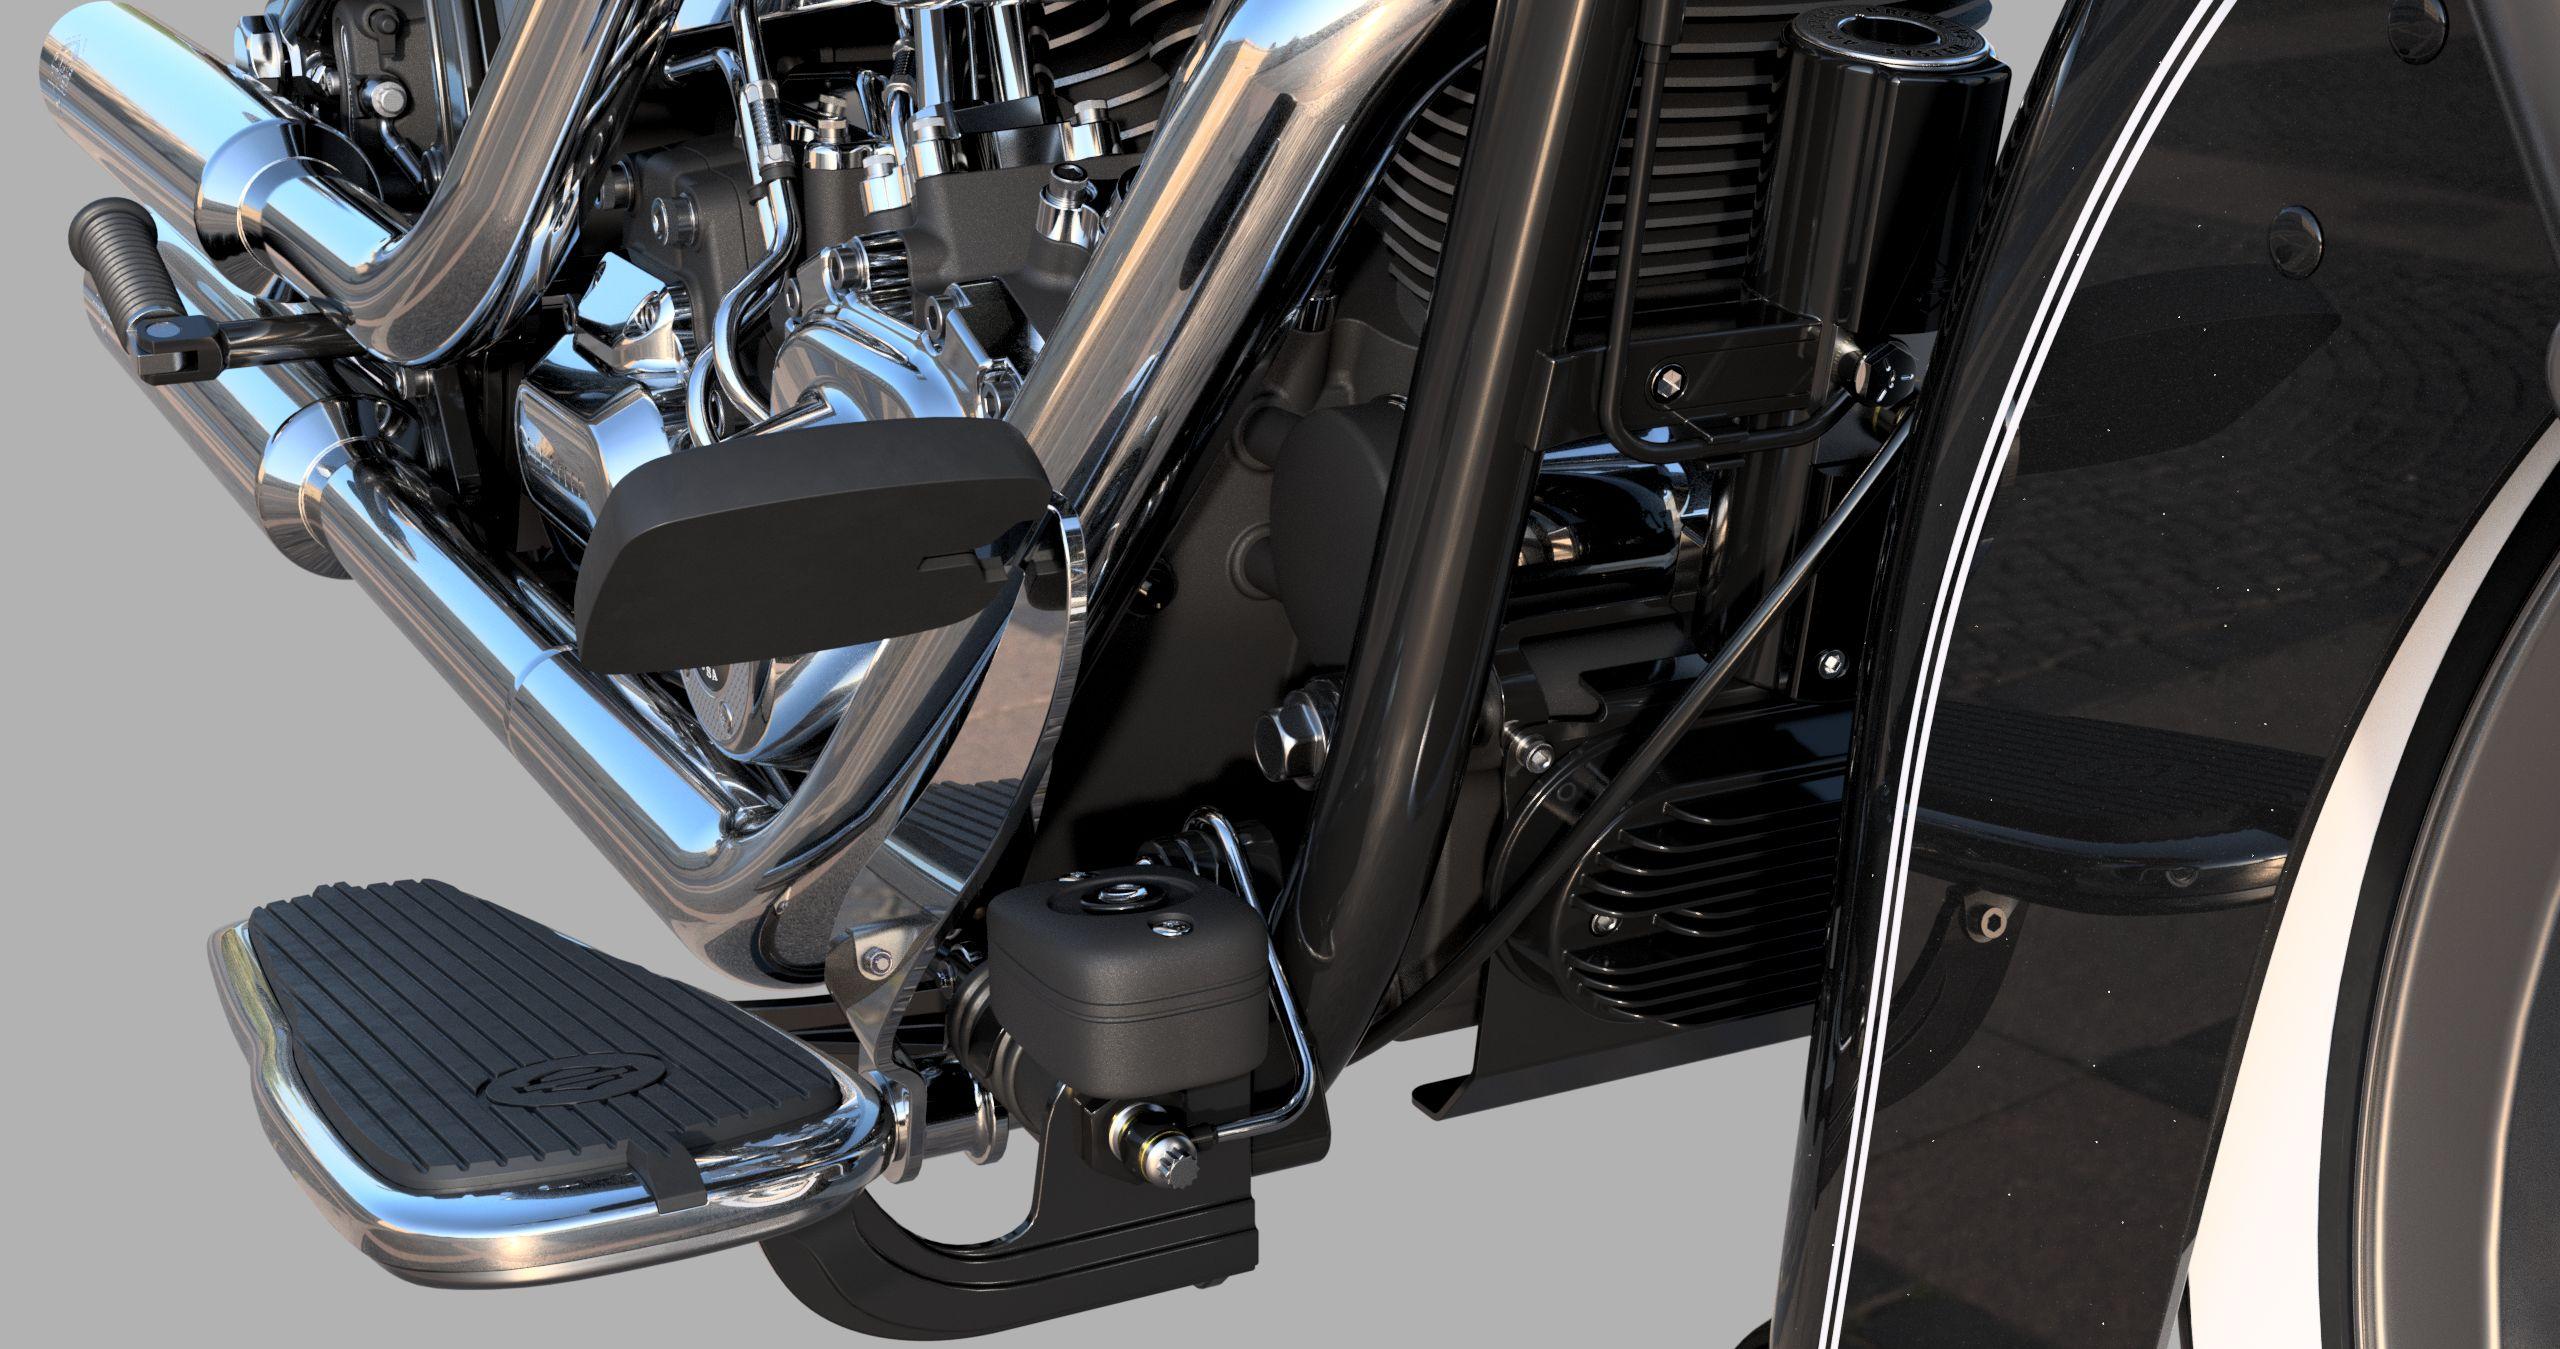 Harley-heritage-frontbrake-3500-3500